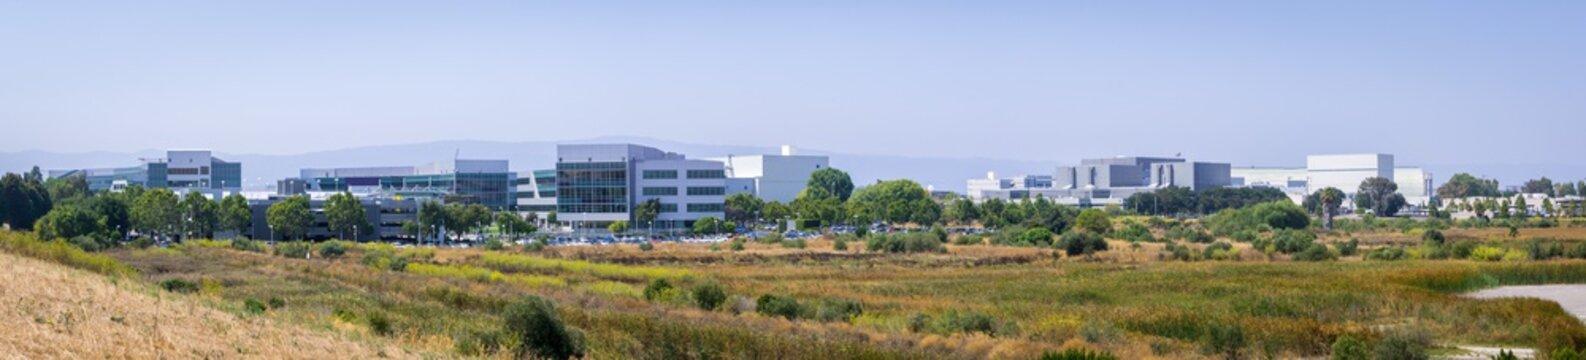 Office buildings on the shoreline of the San Francisco bay area, Sunnyvale, California